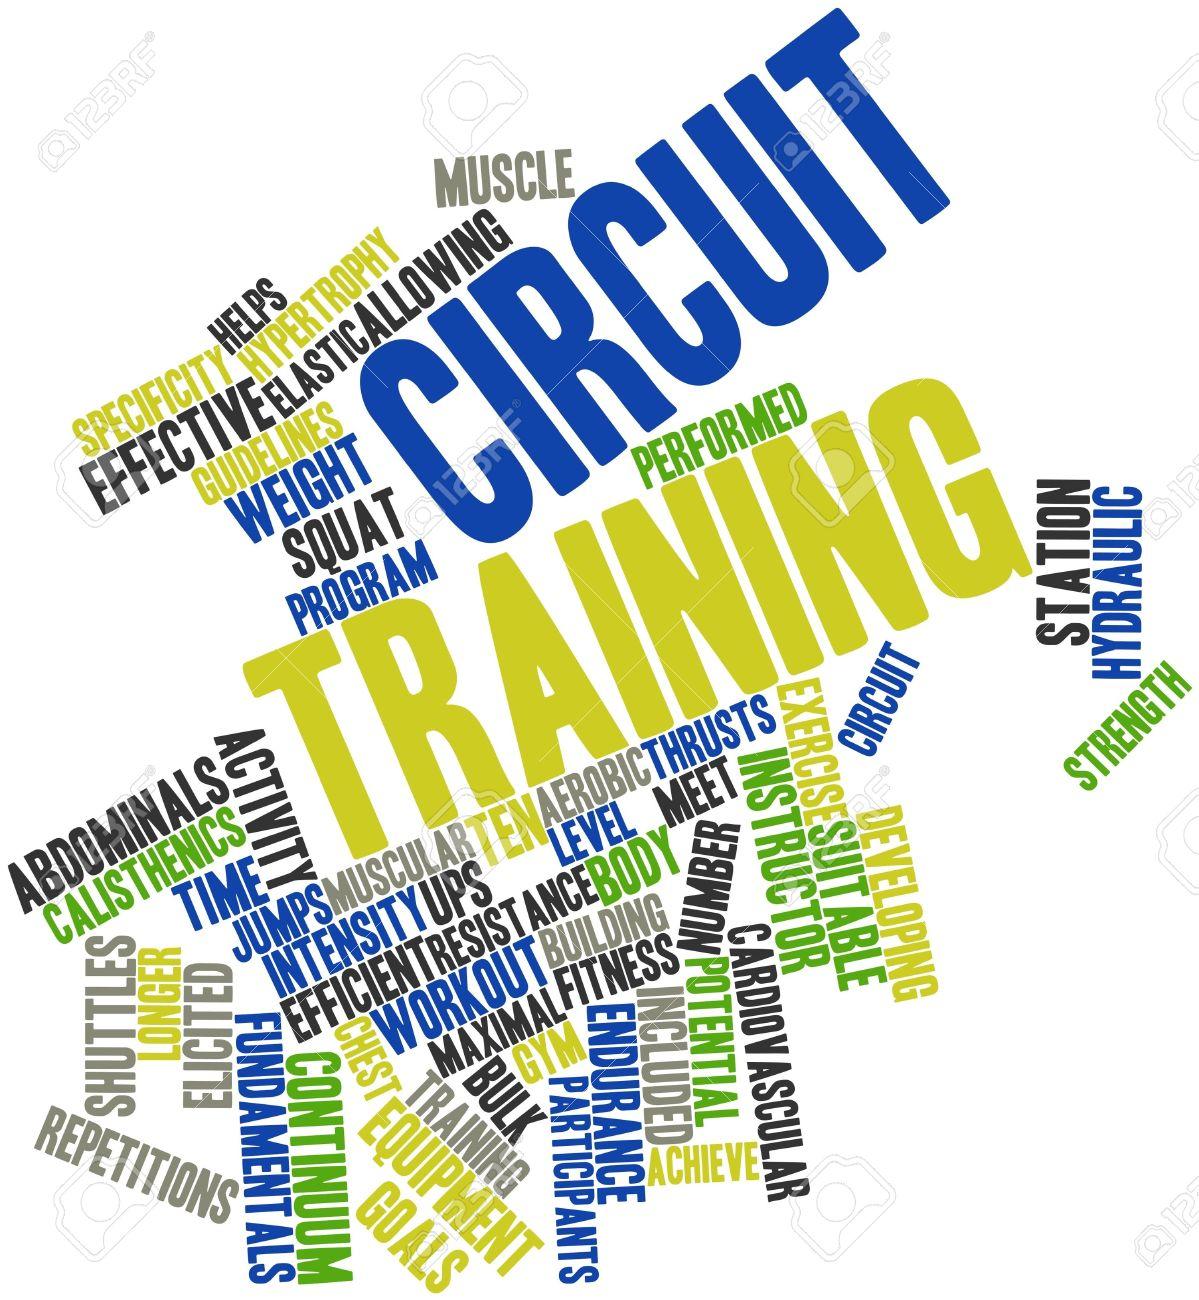 Circuit training photo